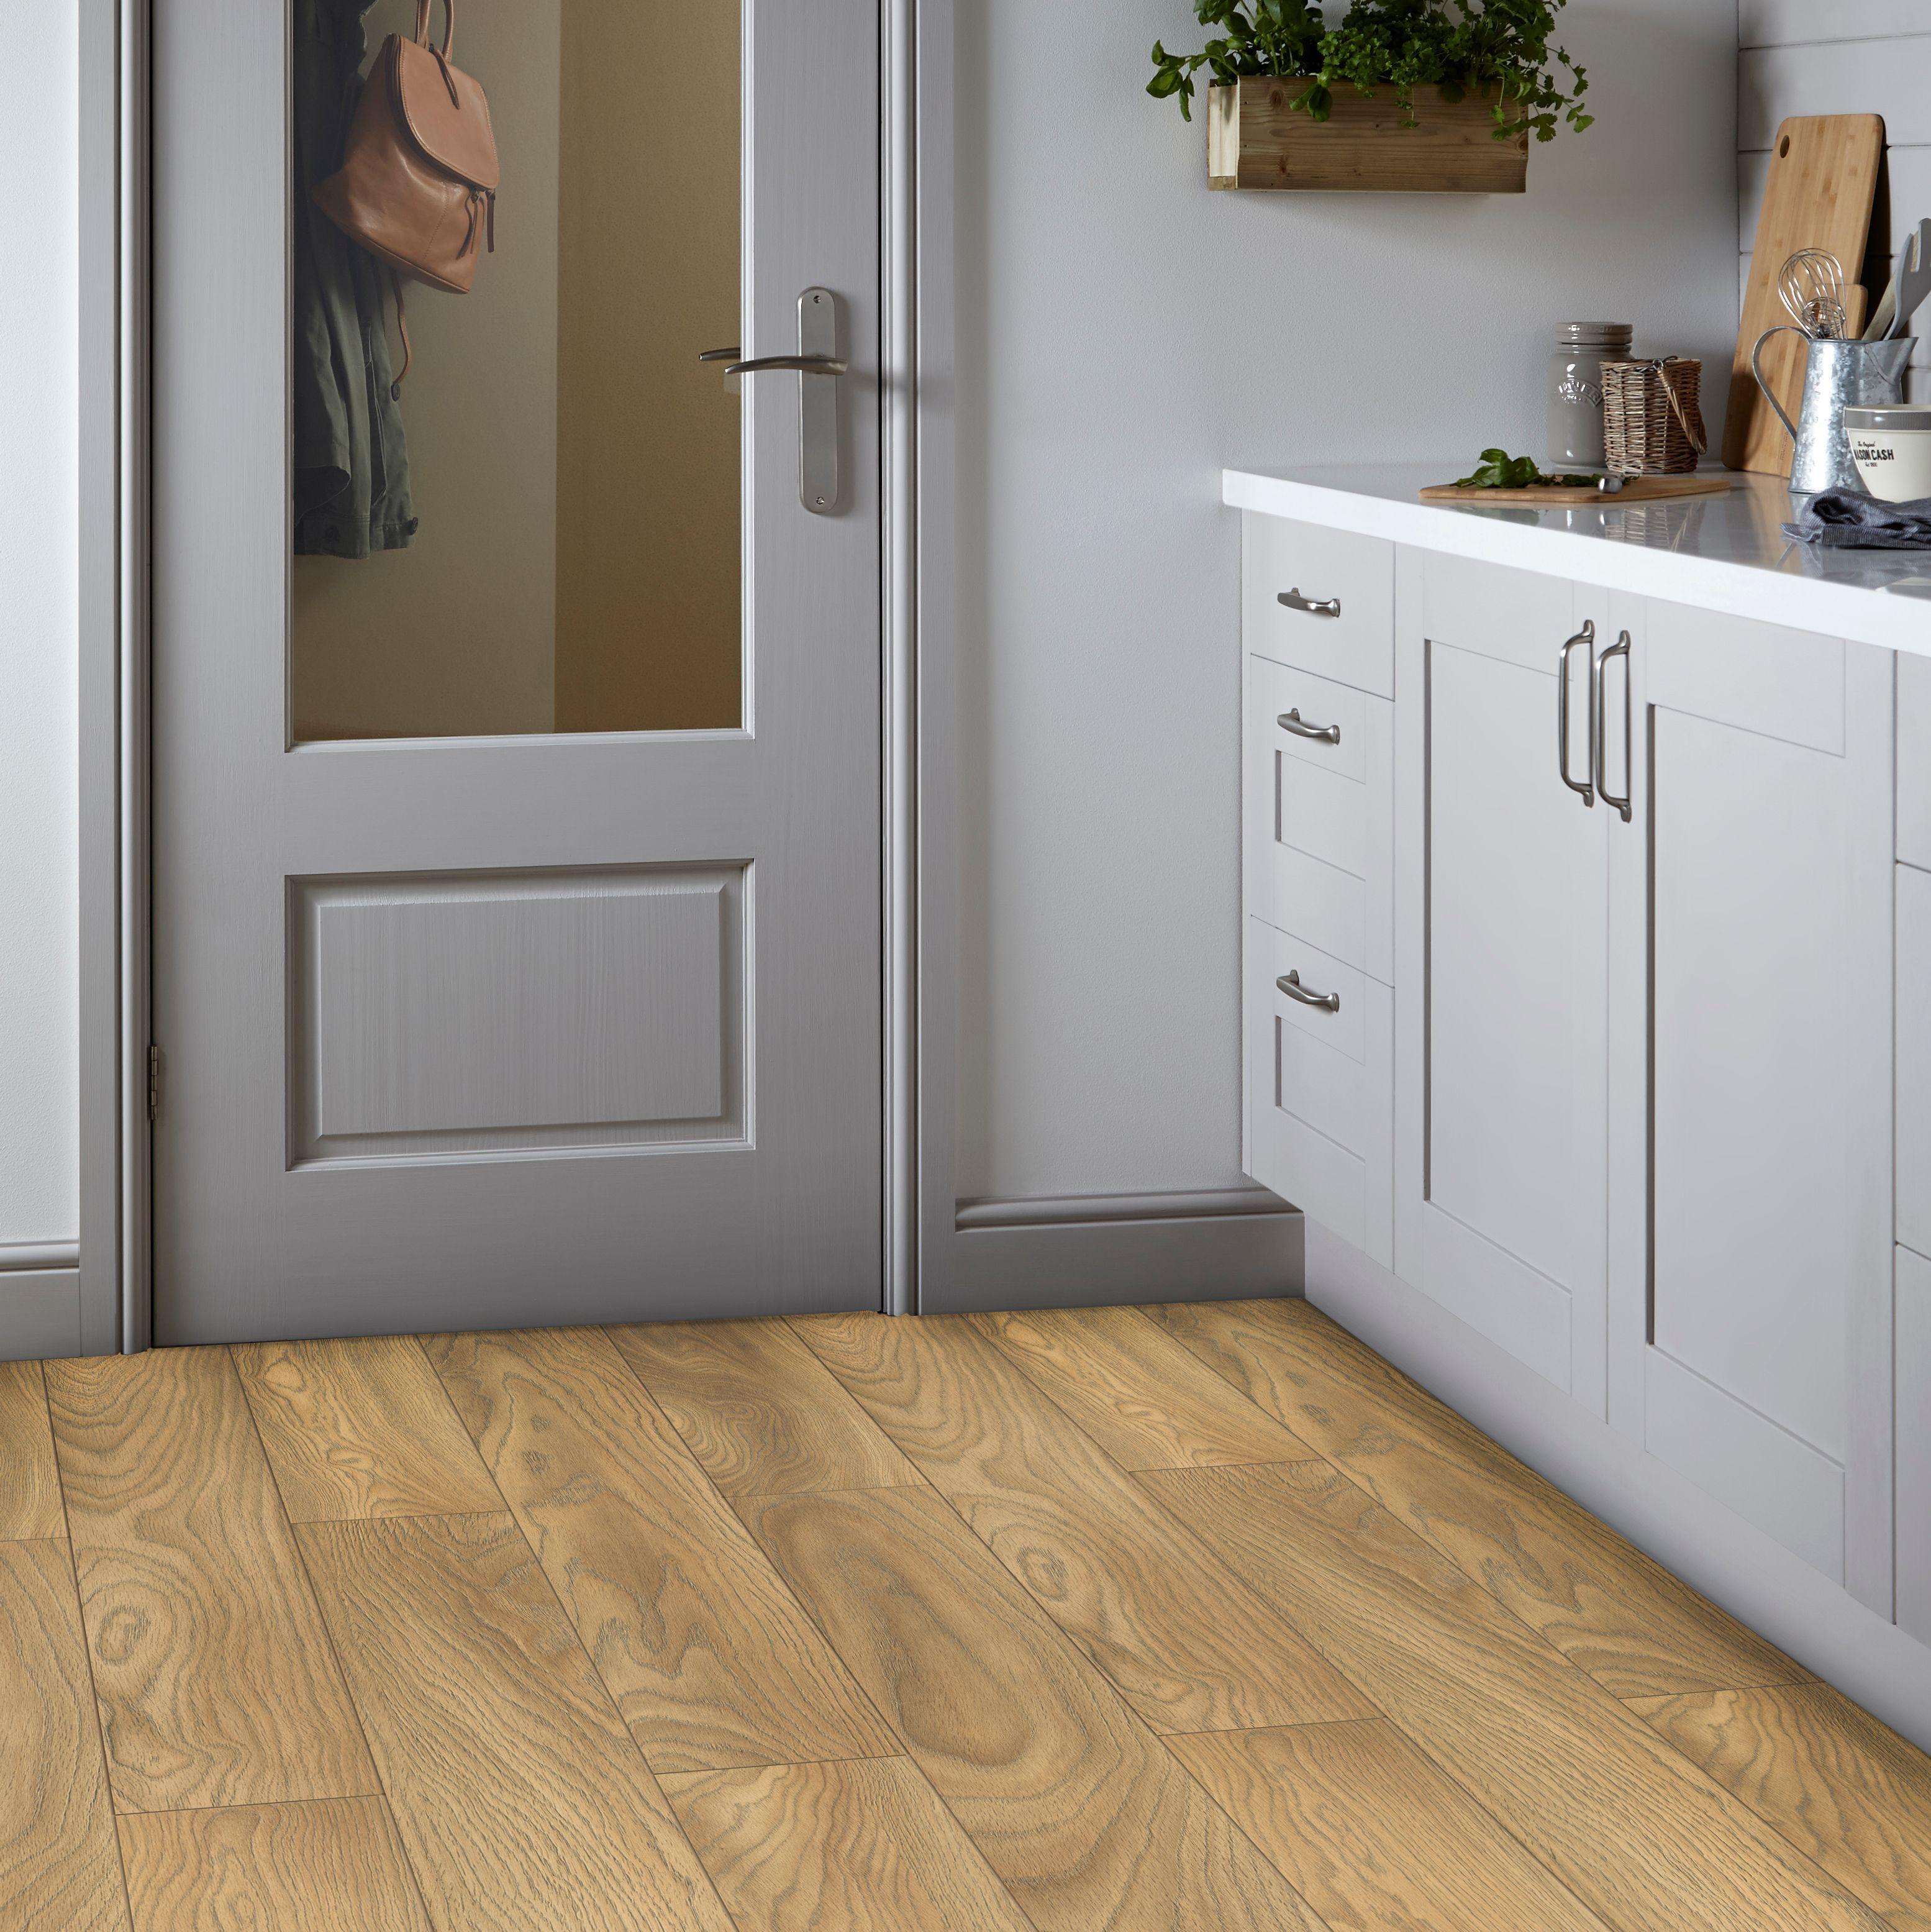 Comlaminate Flooring Packs : ... Sirente Golden Oak Effect Laminate Flooring 1.74m² Pack OUR SALE ITEM